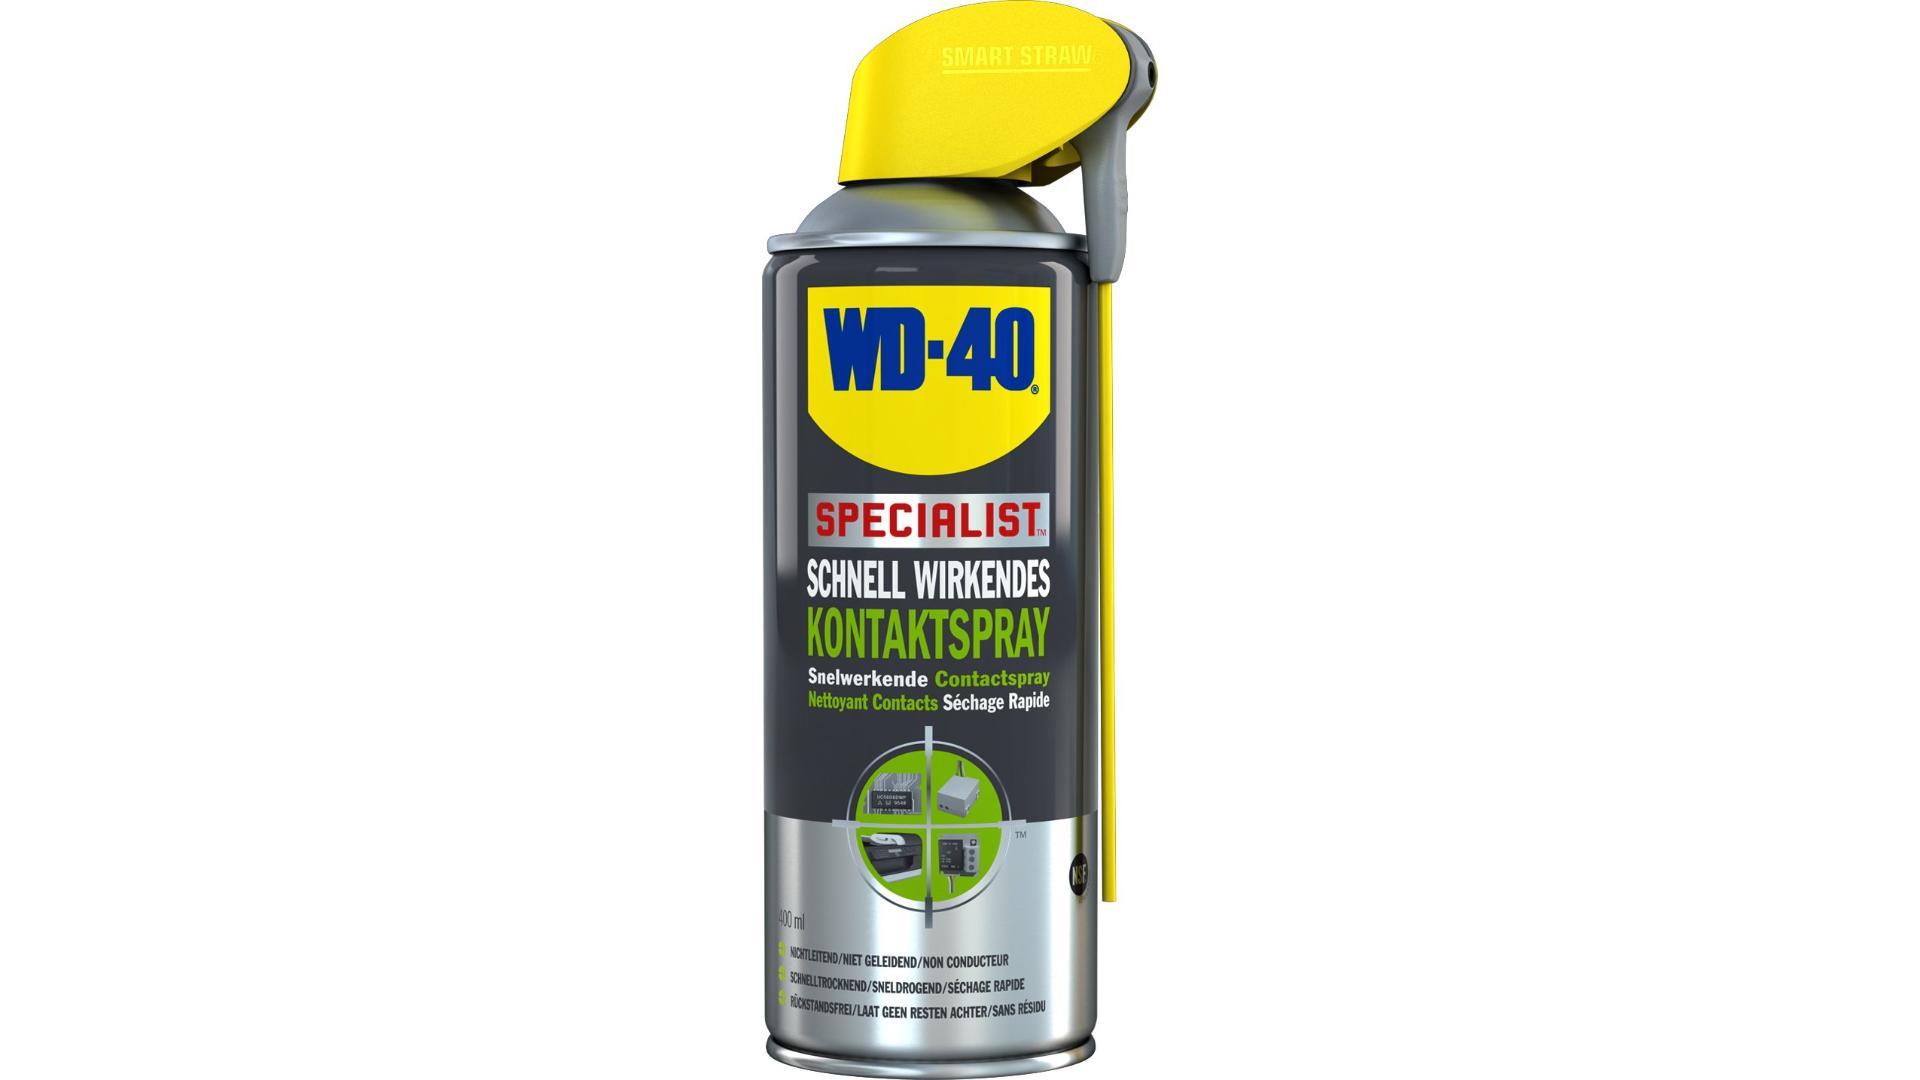 WD-40 Univerzálny mazací sprej Specialist WLG